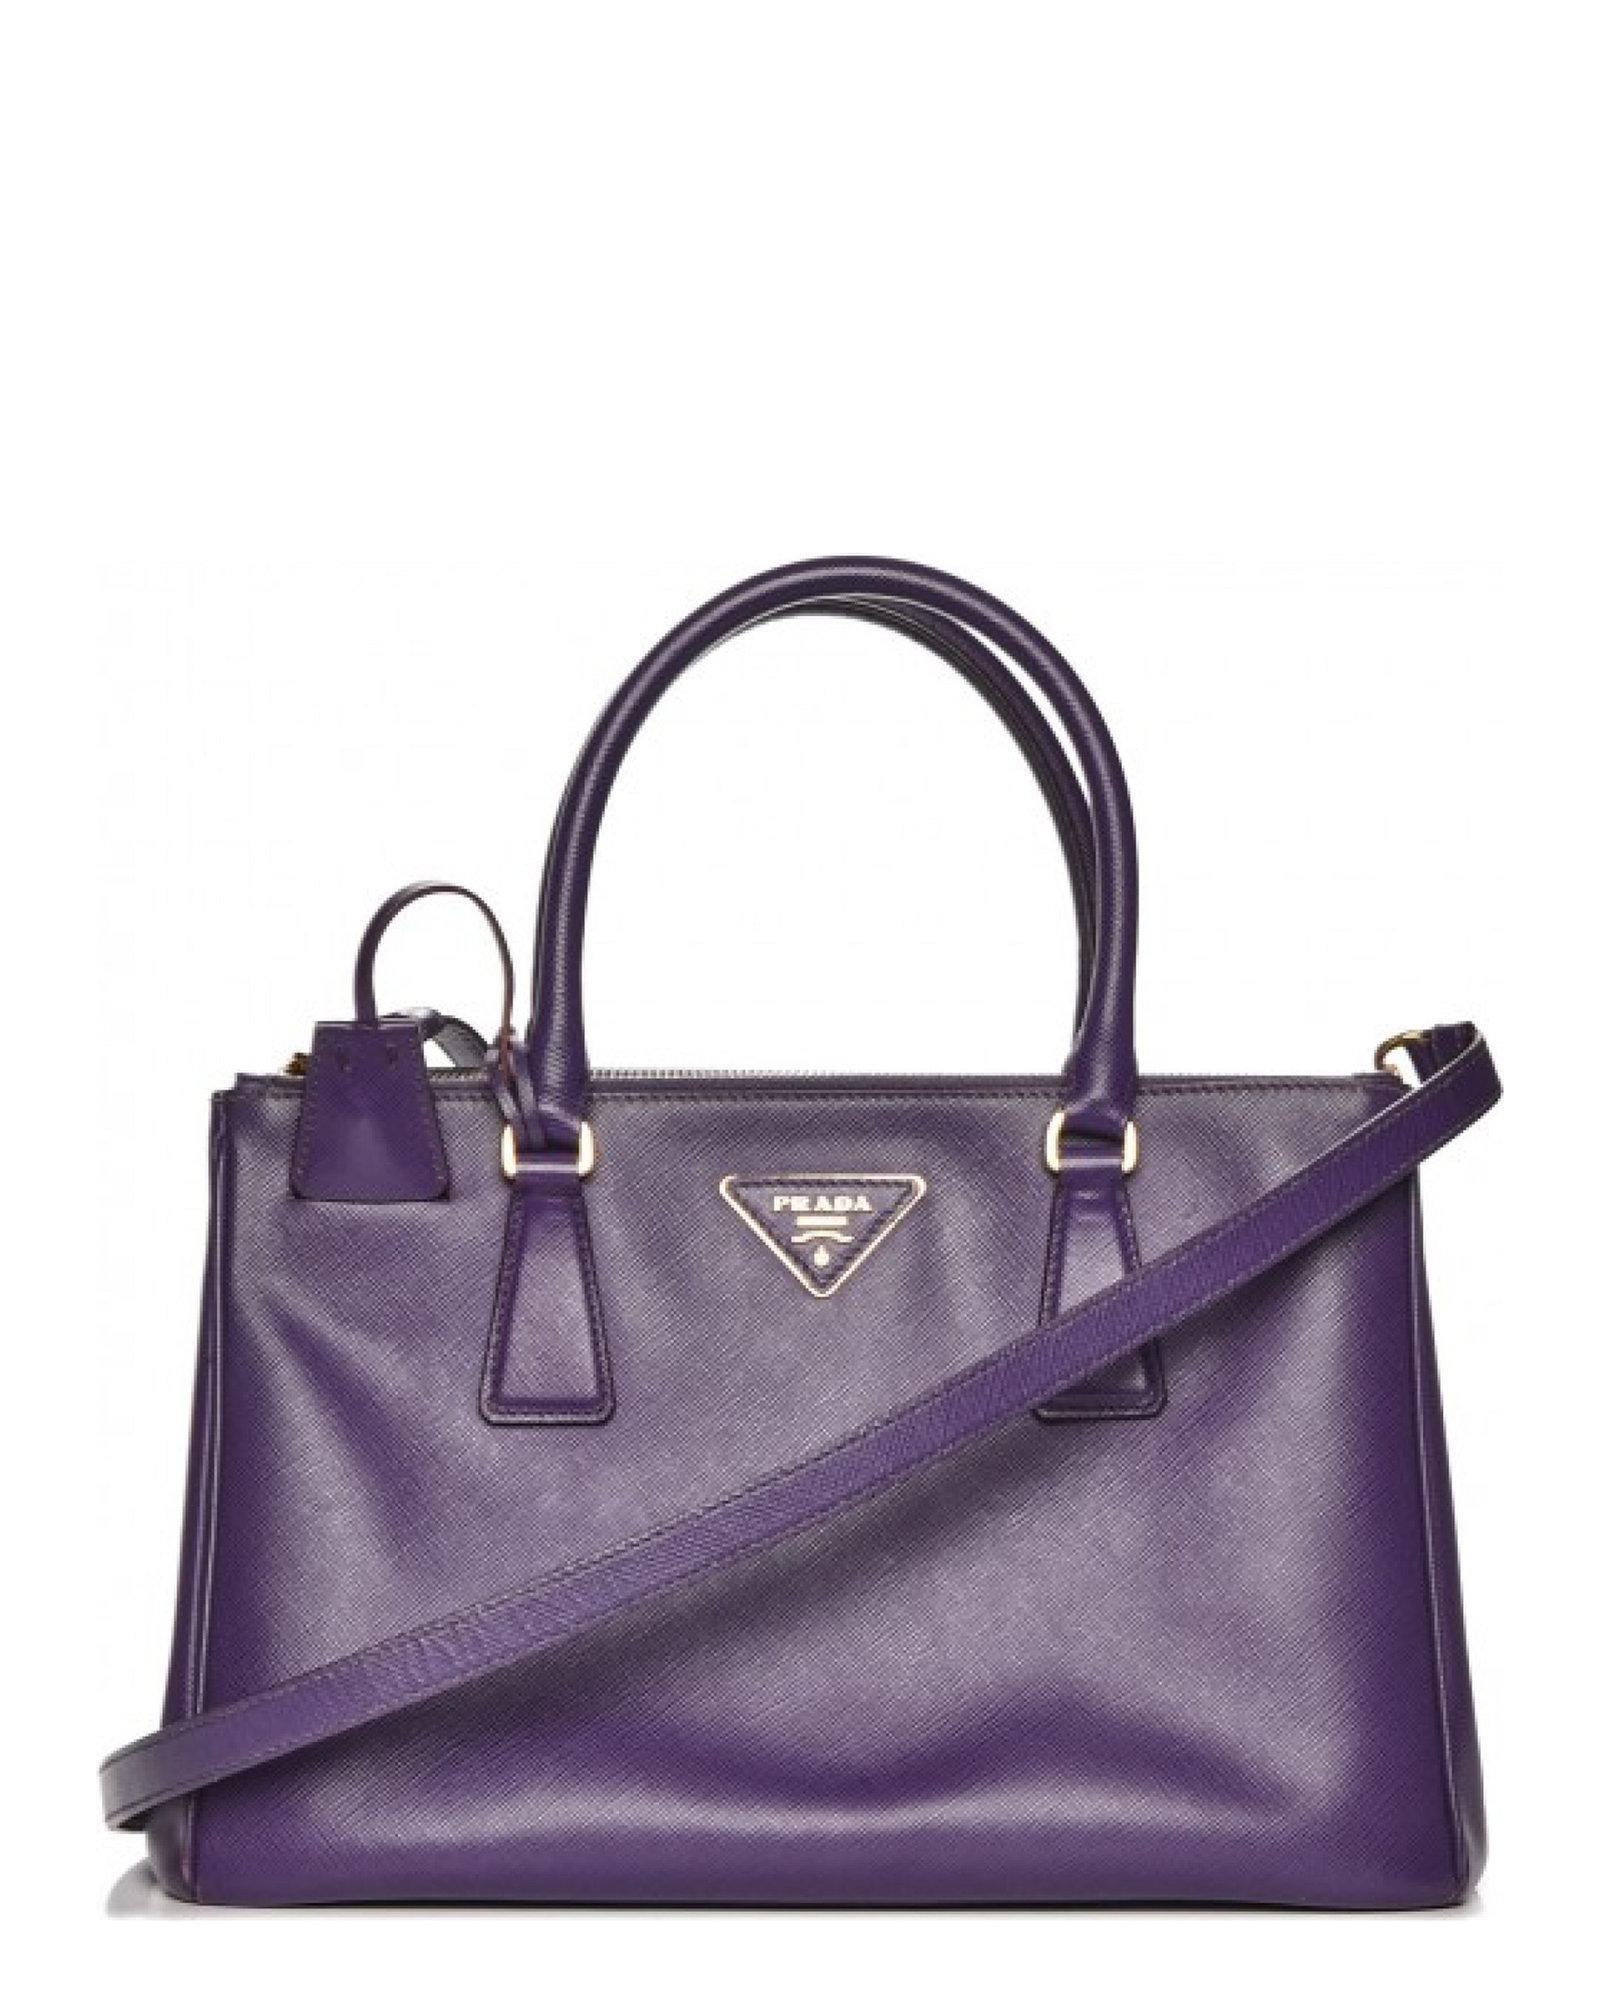 878e2c5dded6 italy prada. womens purple shoulder bag 16470 b7161